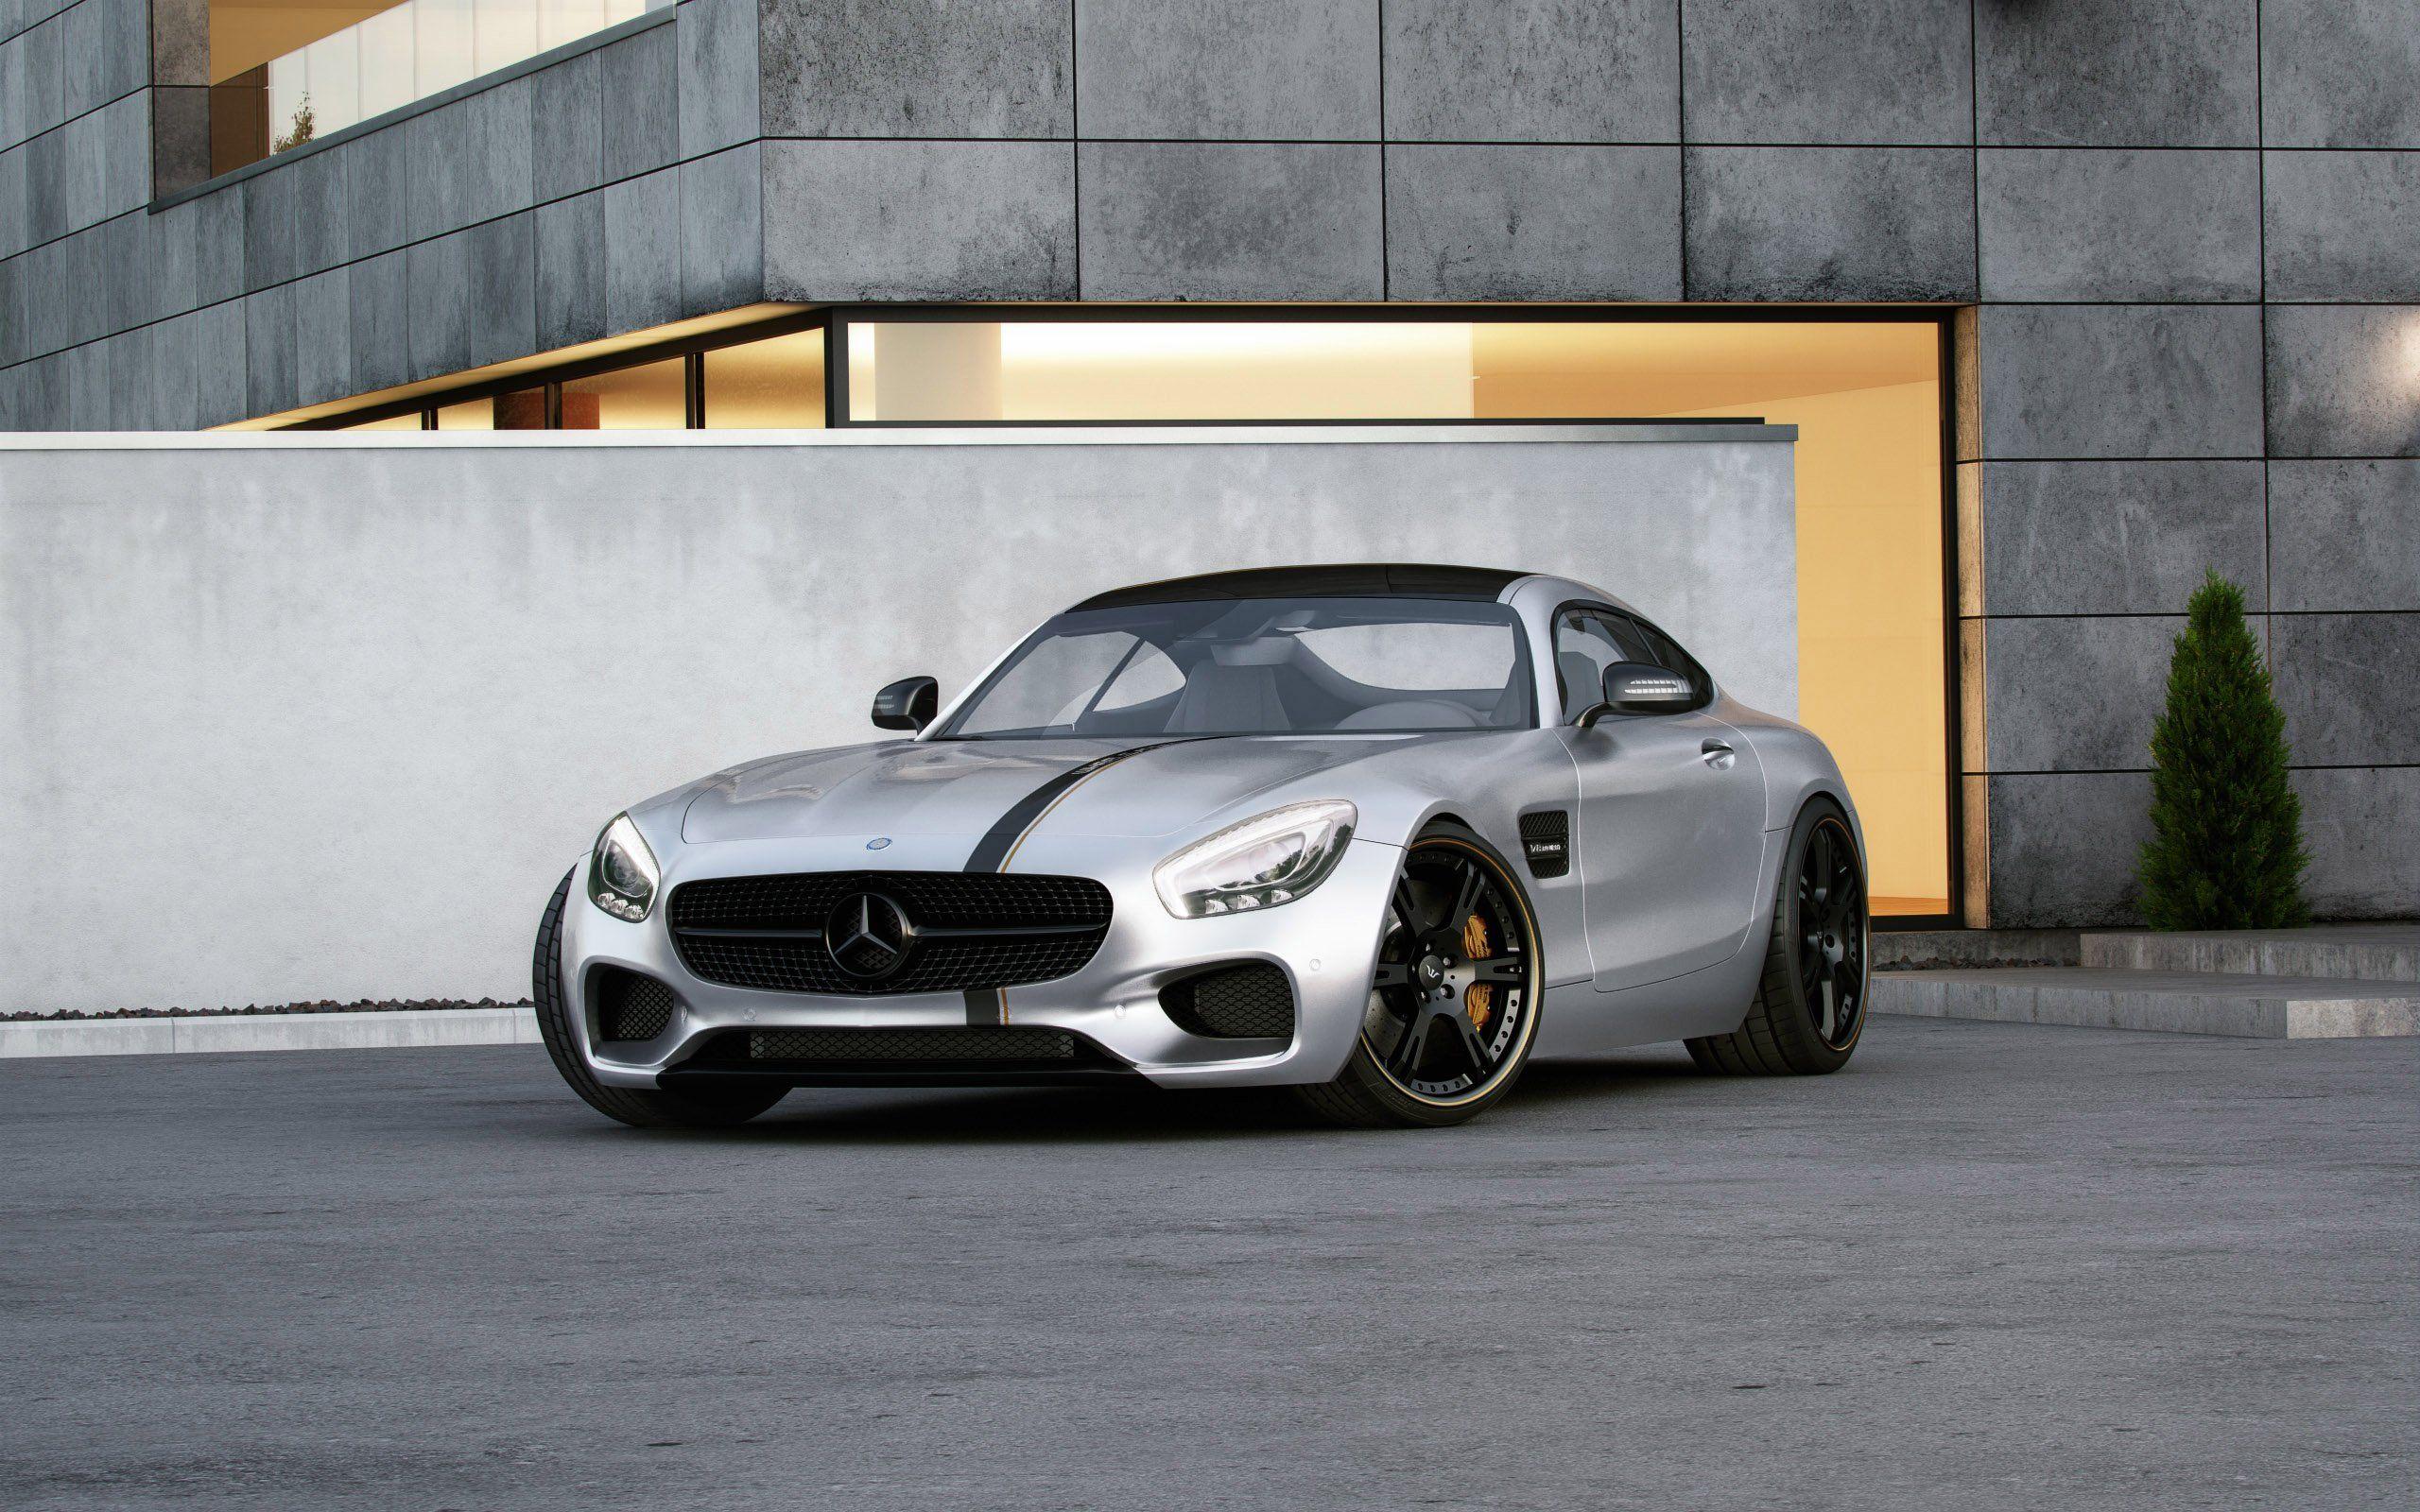 2015 Wheelsandmore - Mercedes AM GT - Dark-Cars Wallpapers